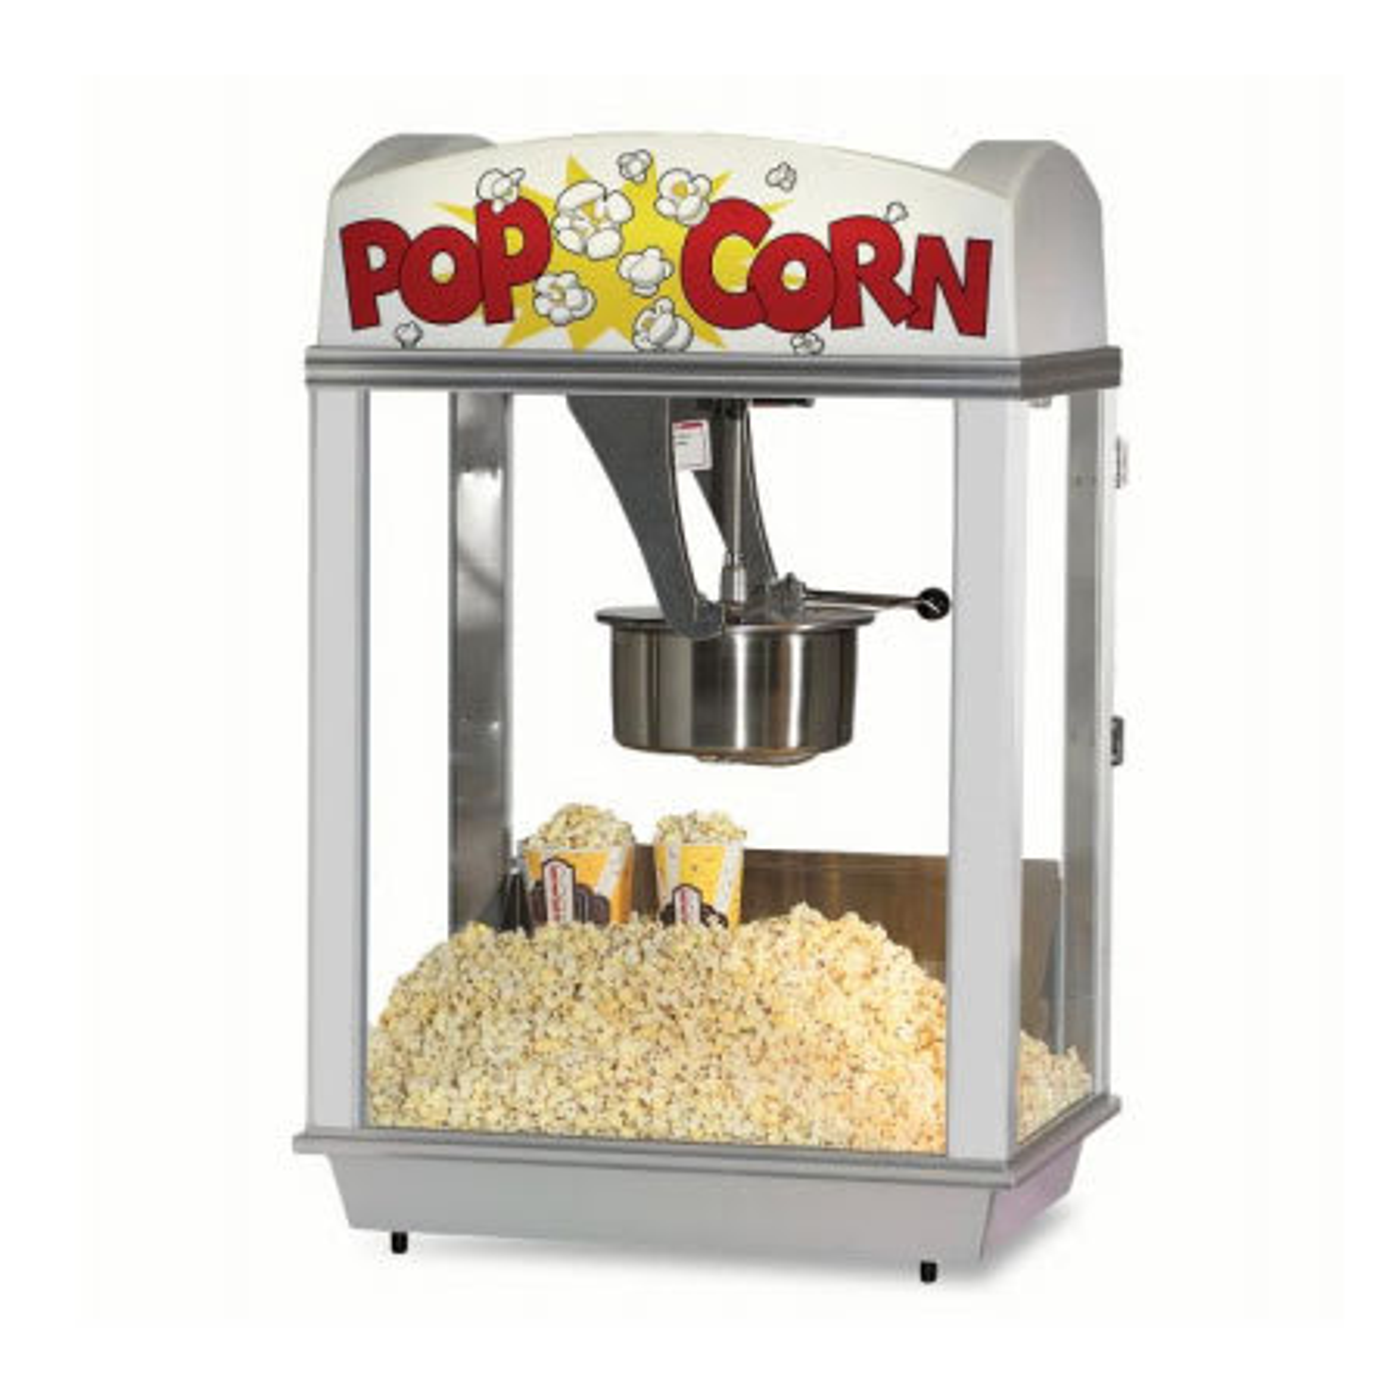 Gold Medal 2001 Citation Popcorn Machine w/ 16 oz Unimaxx Kettle & White Dome, 120v